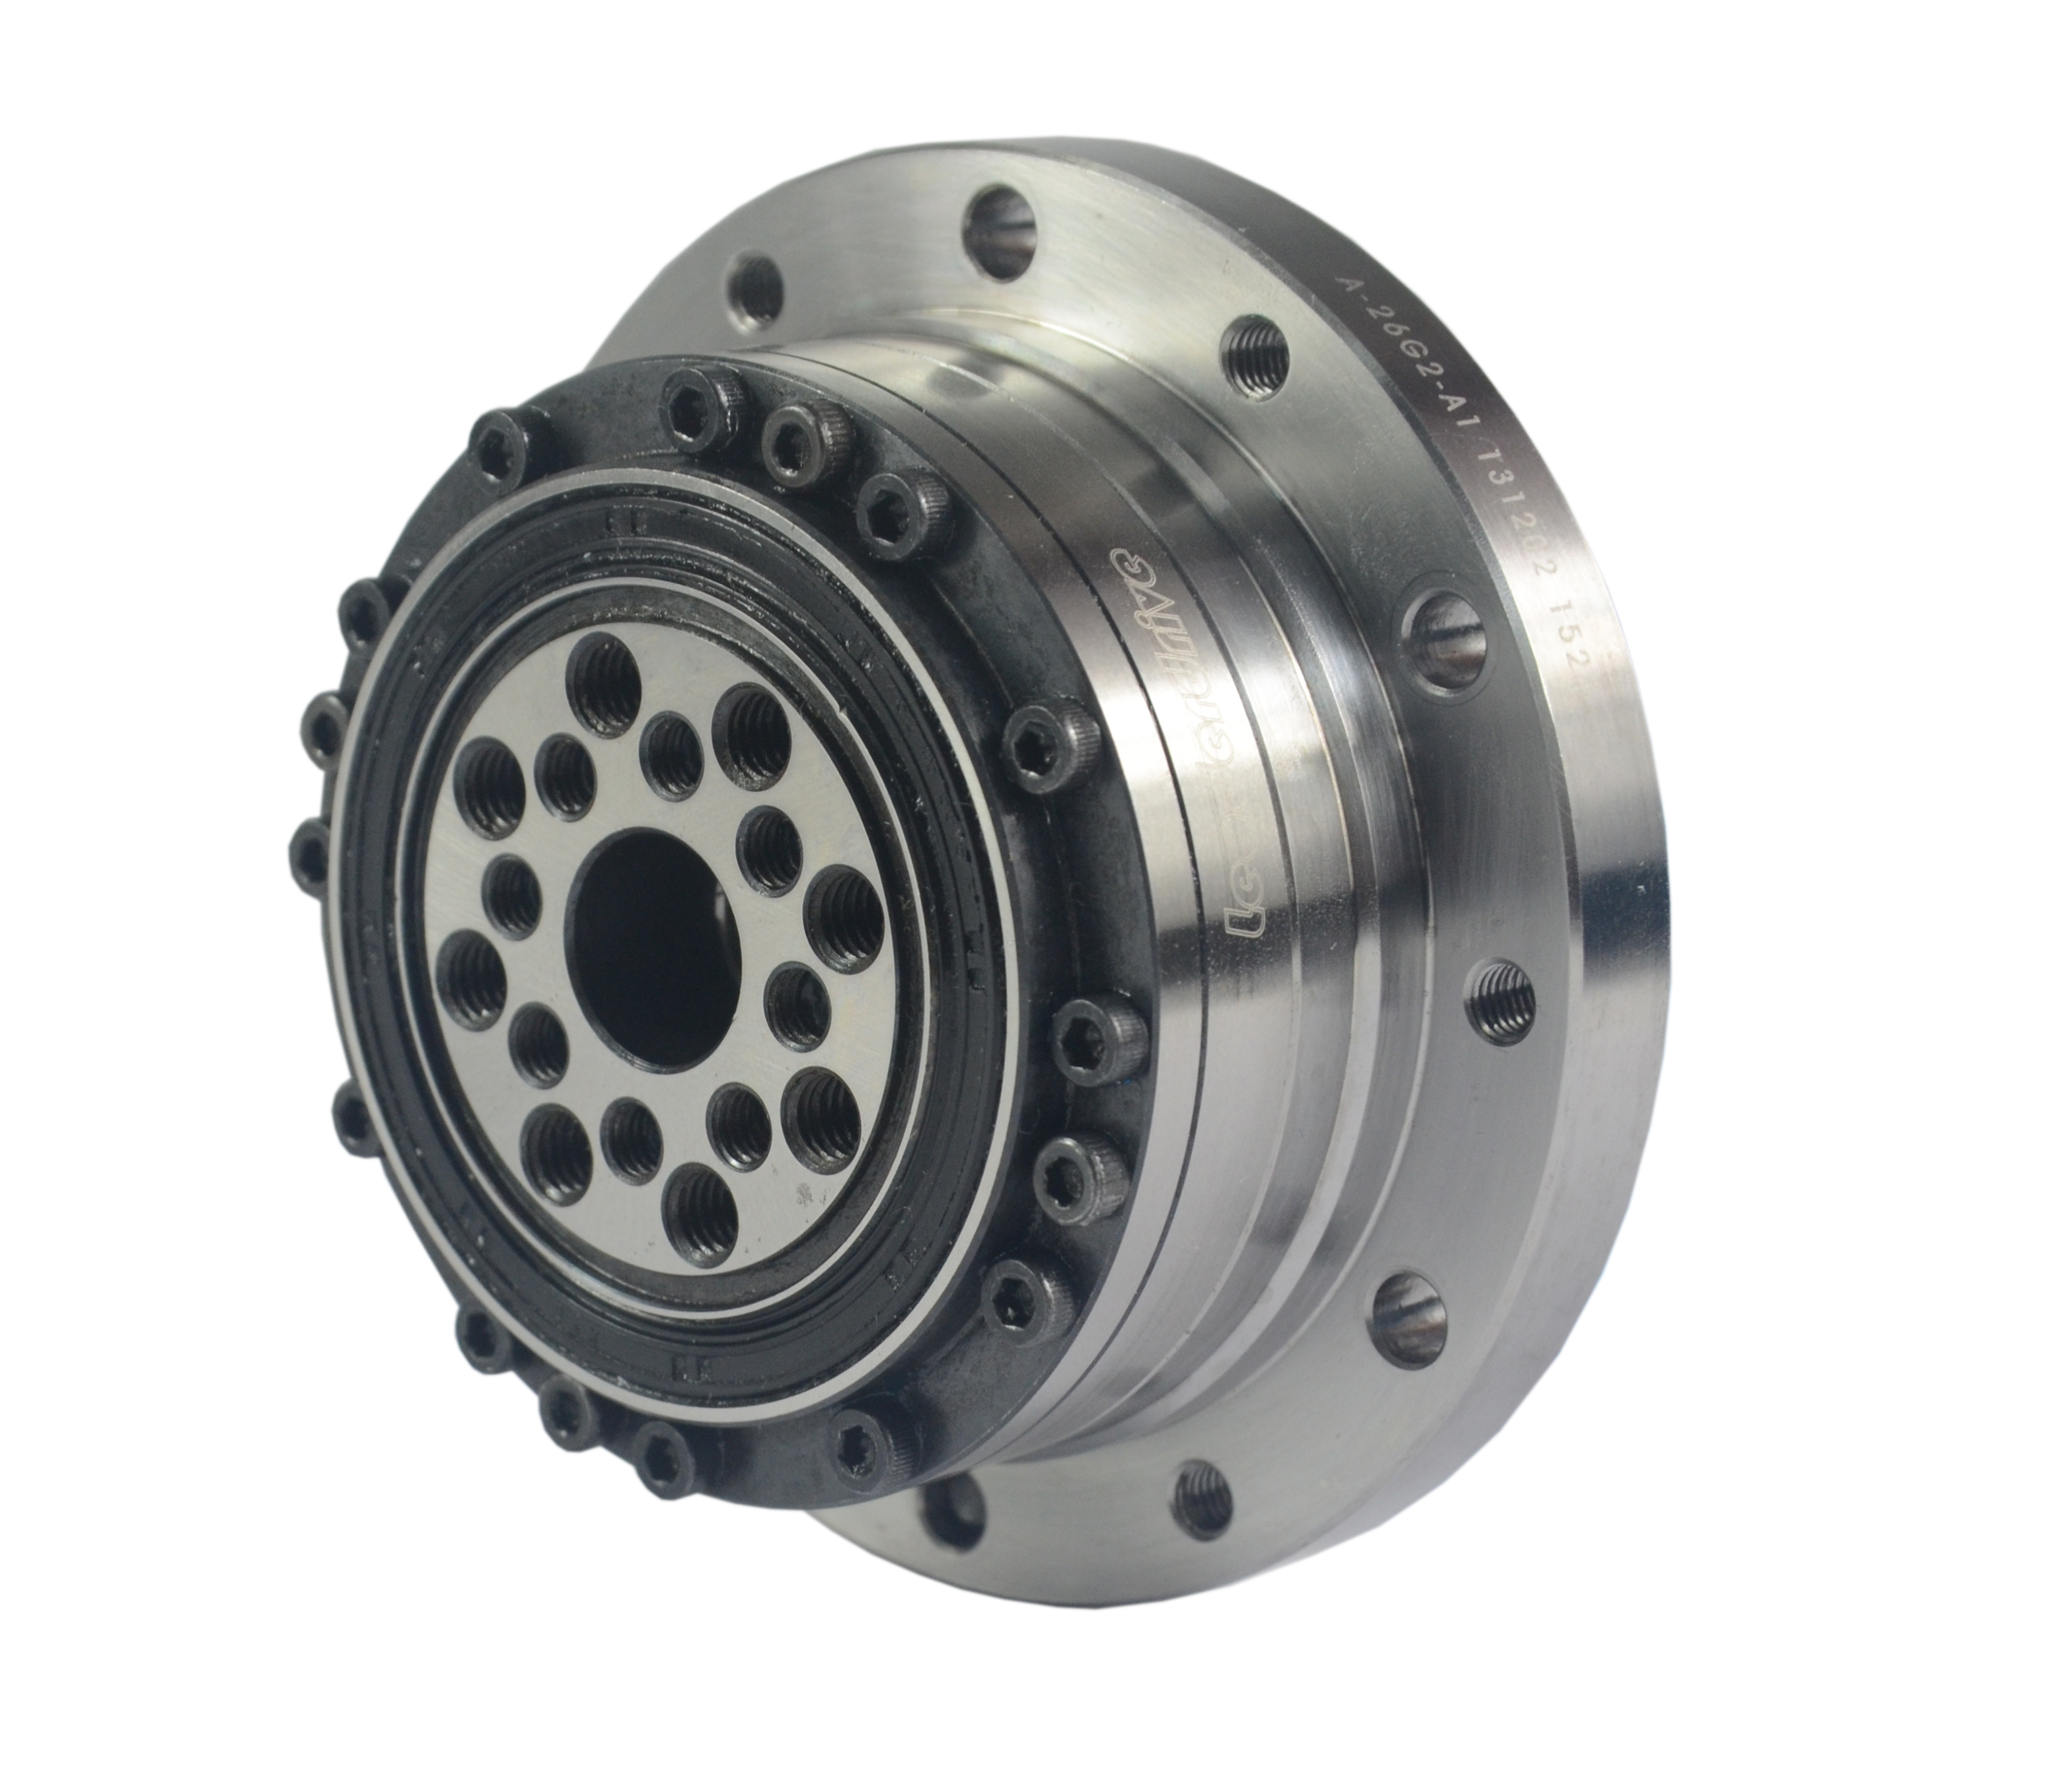 LCSG-I型高转矩系列谐波减速器